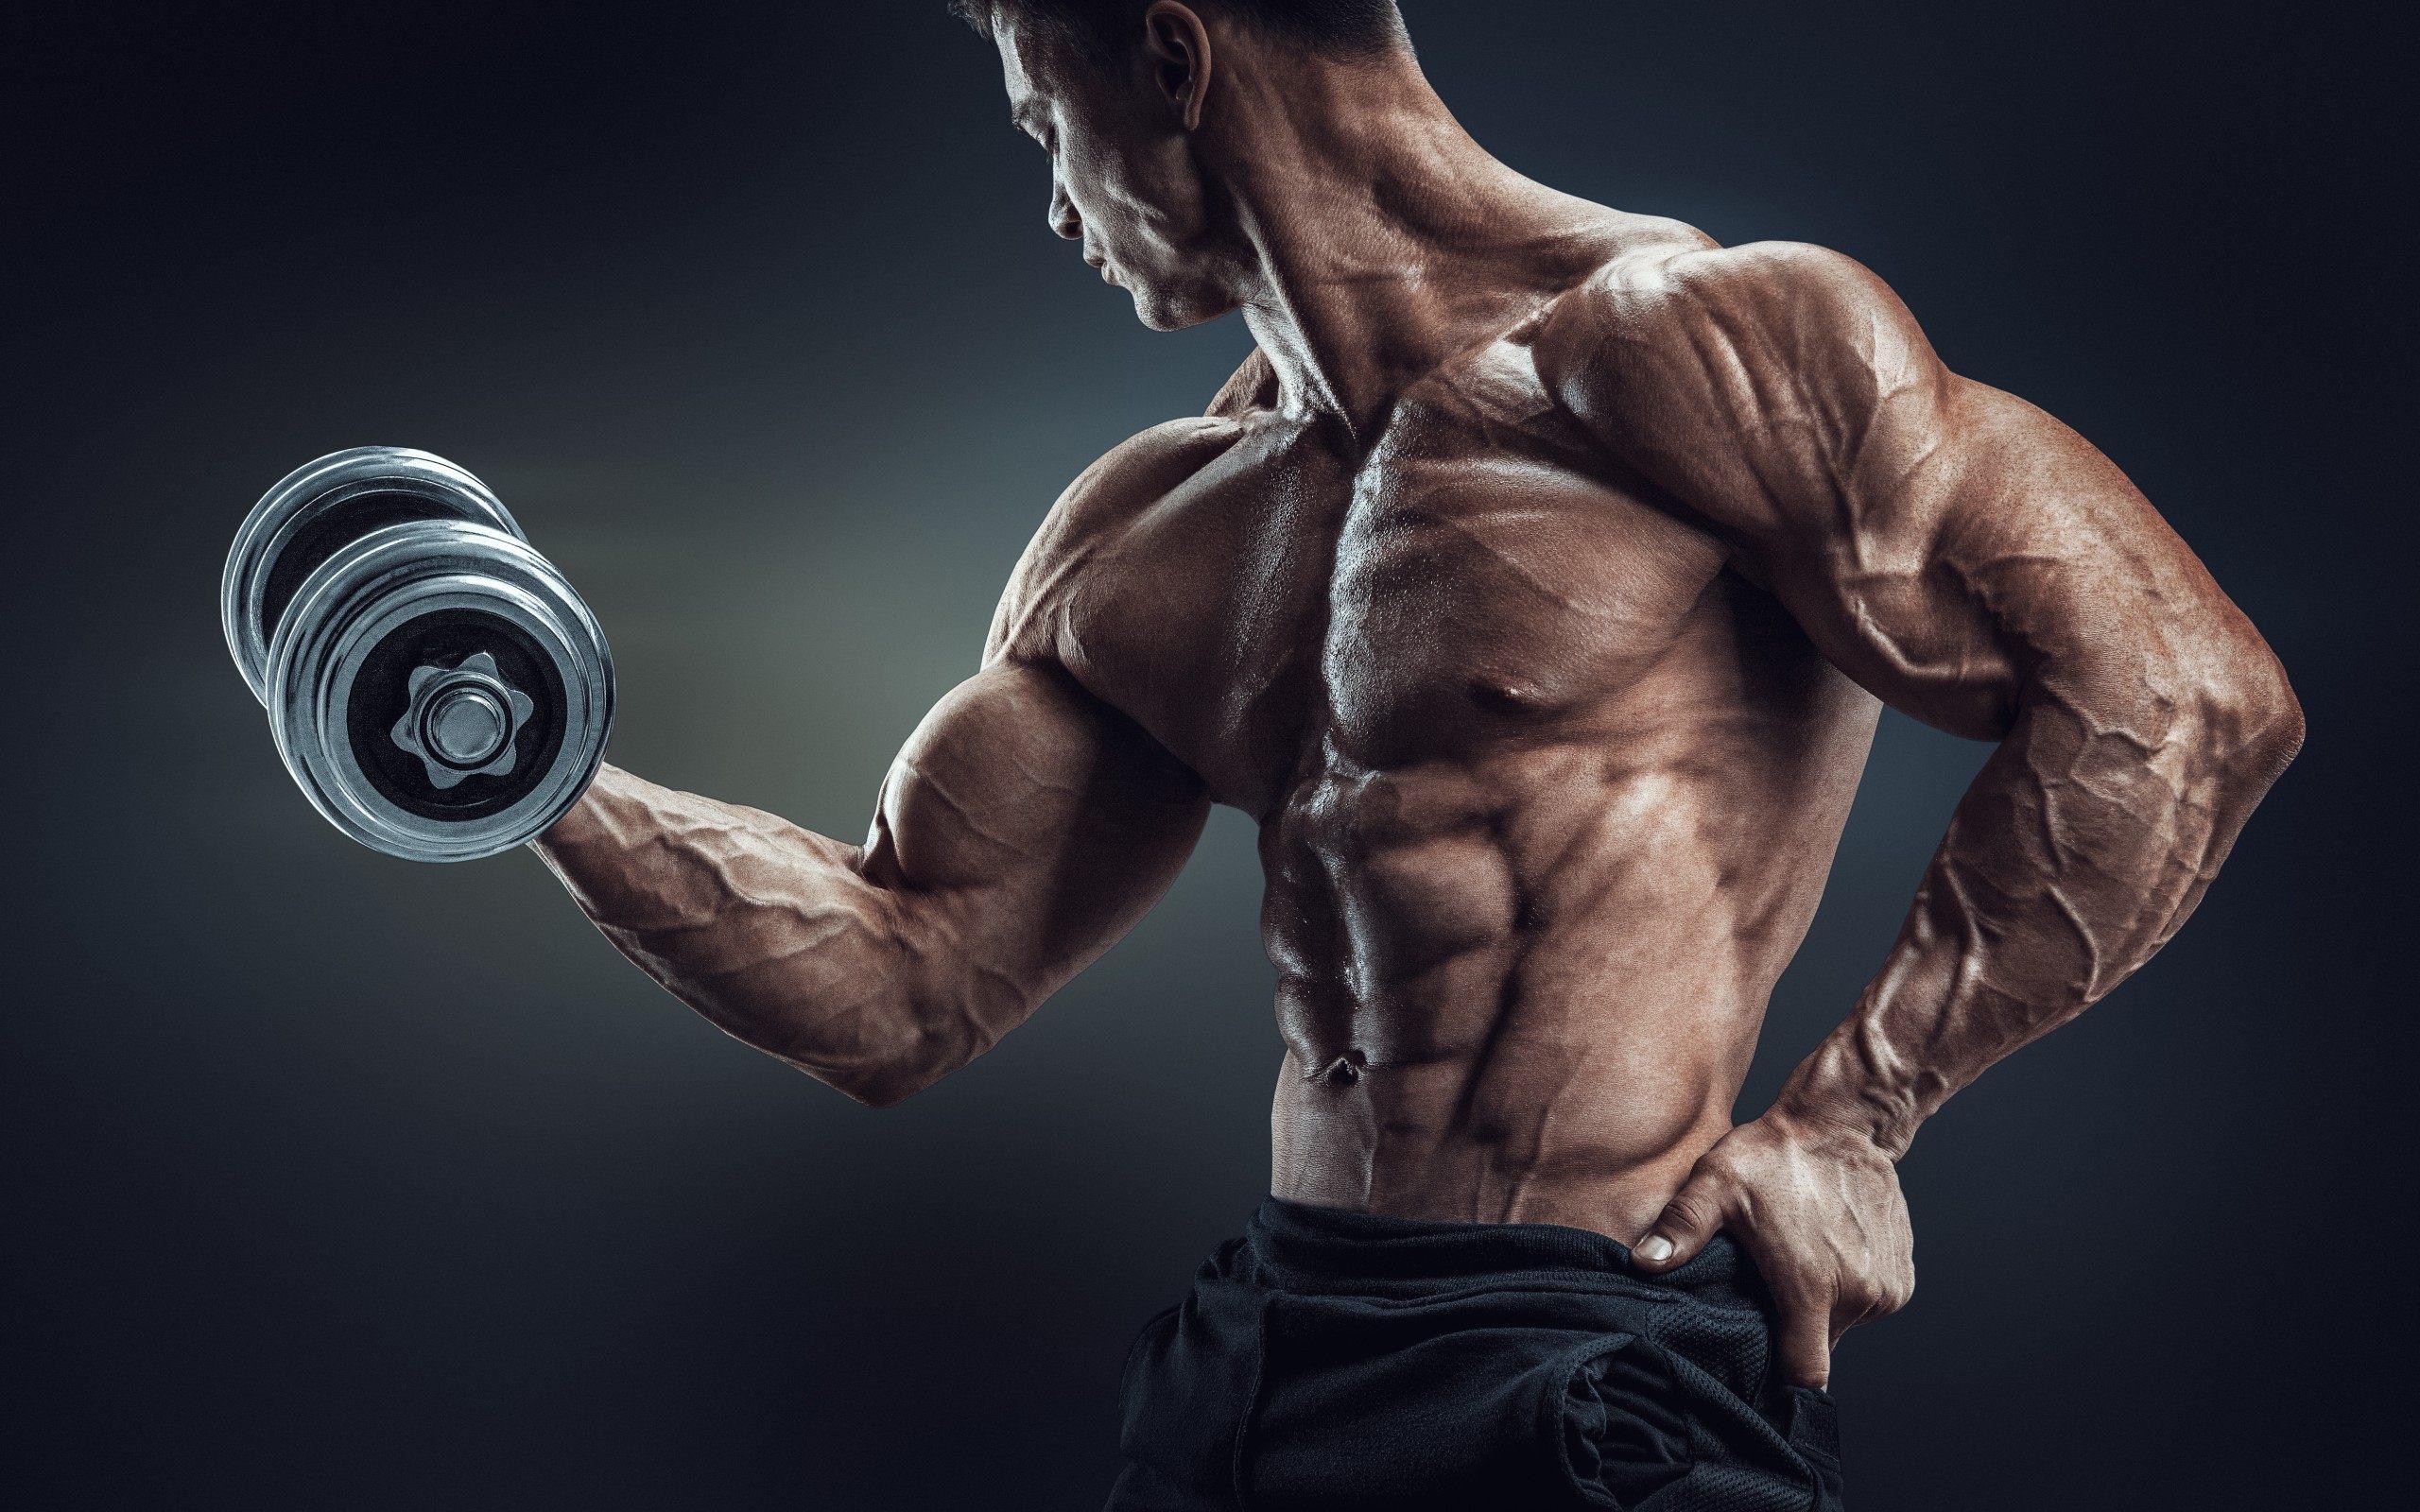 Bodybuilding Wallpaper Sf Wallpaper